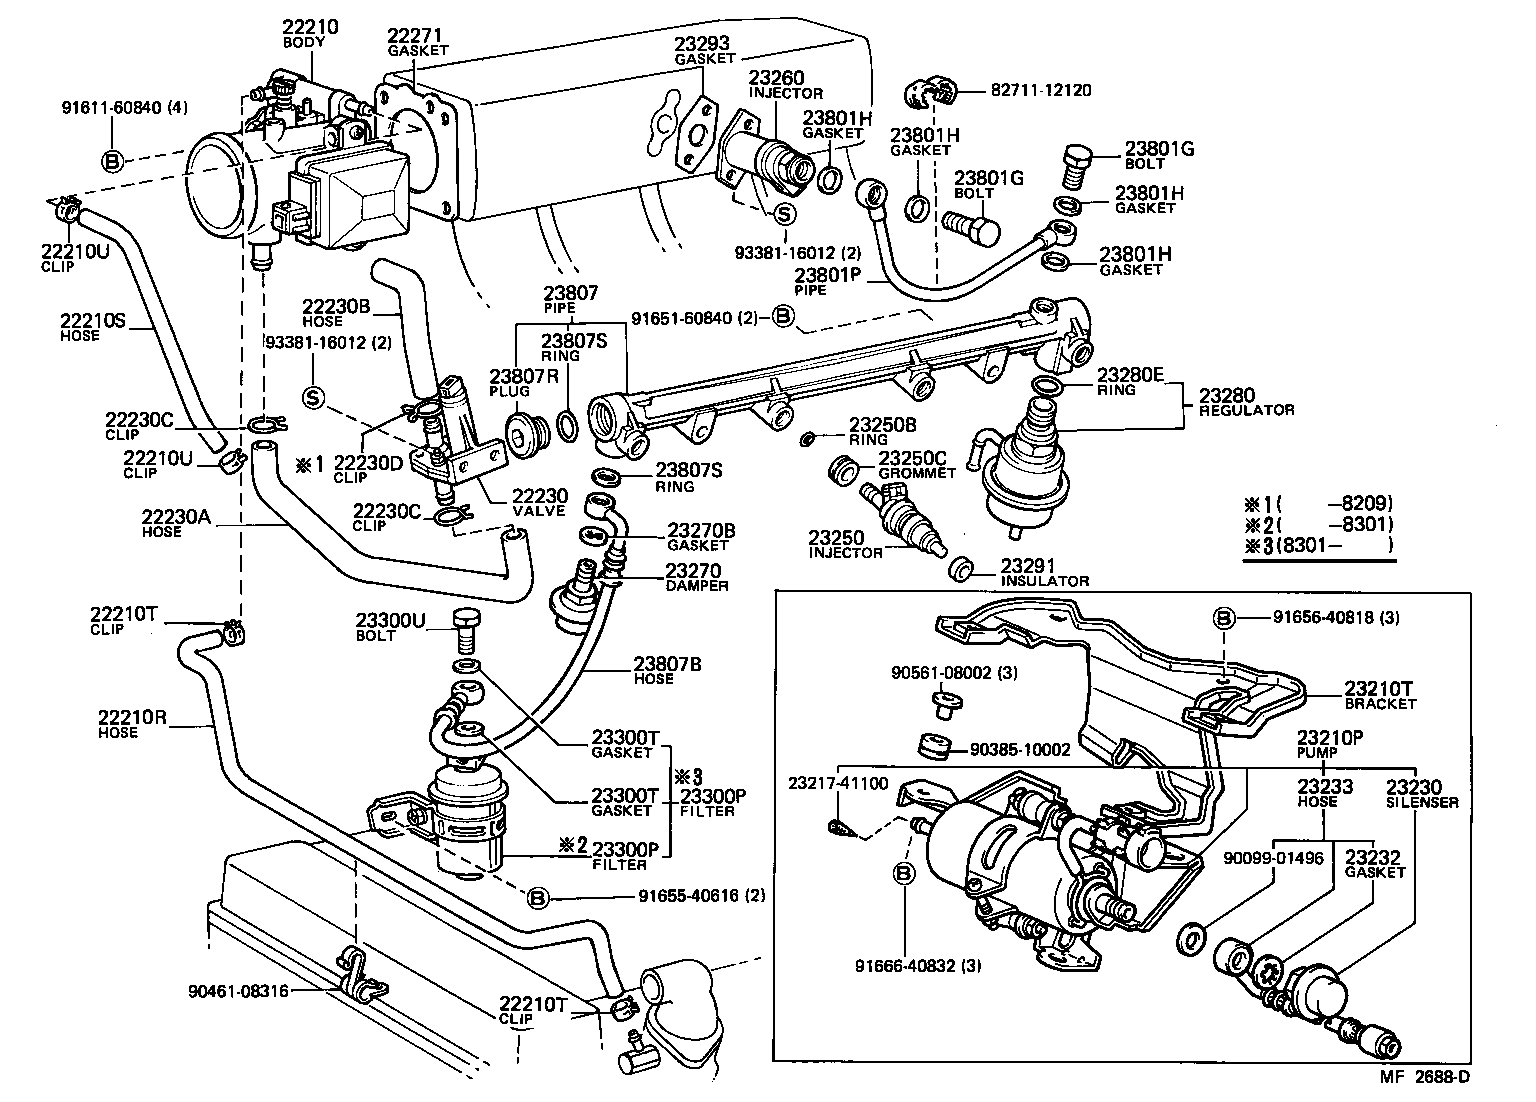 hight resolution of 1990 toyota celica engine diagram car engine parts diagram 1990 toyota supra body kit 1990 toyota